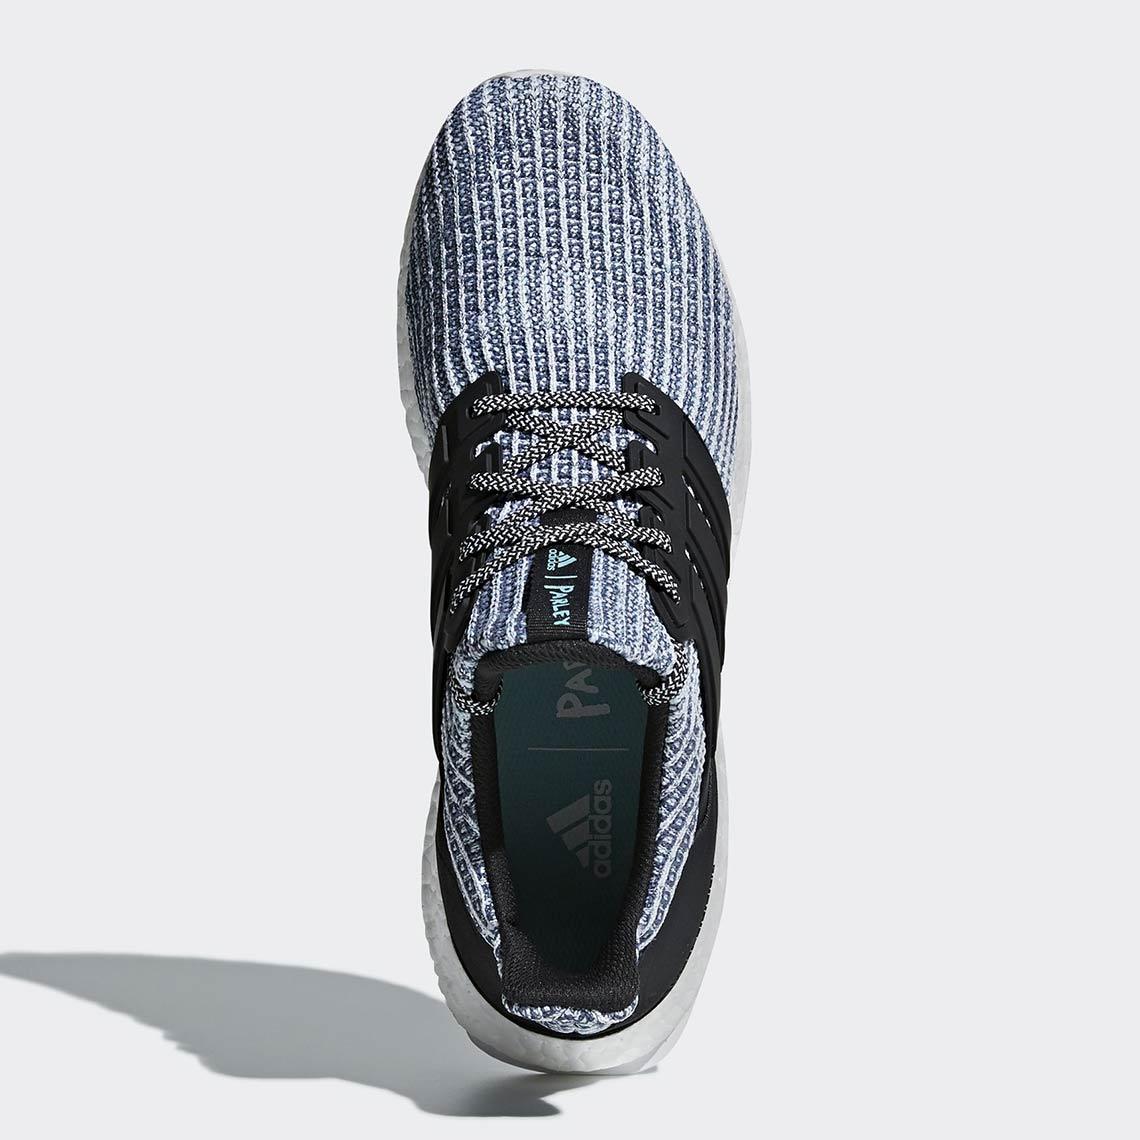 parley-adidas-ultra-boost-bc0248-2